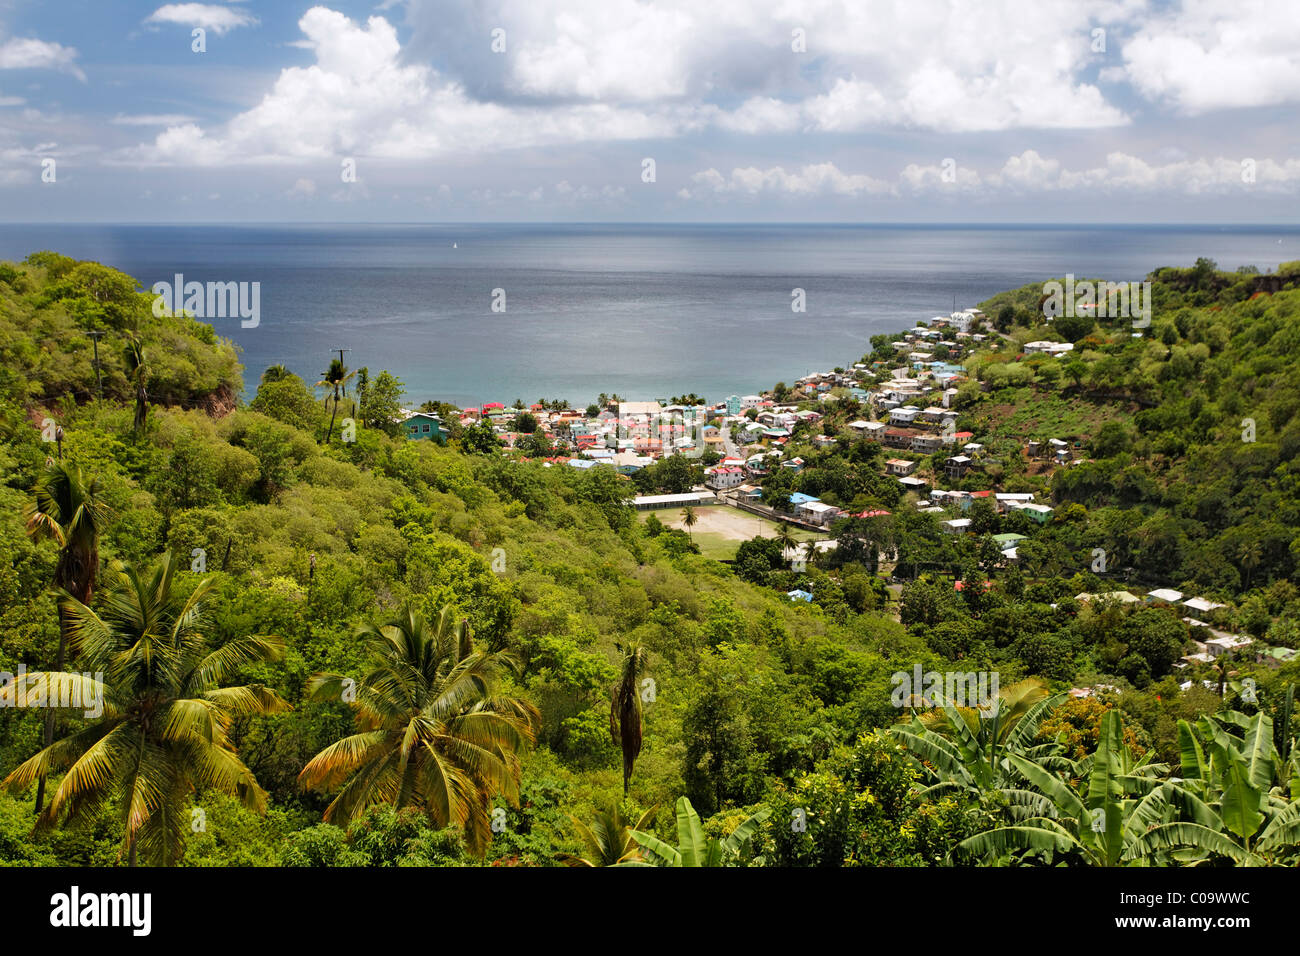 Green tropical island landscape, bay, ocean, city, Canaries, Saint Lucia, LCA, Windward Islands, Lesser Antilles, - Stock Image